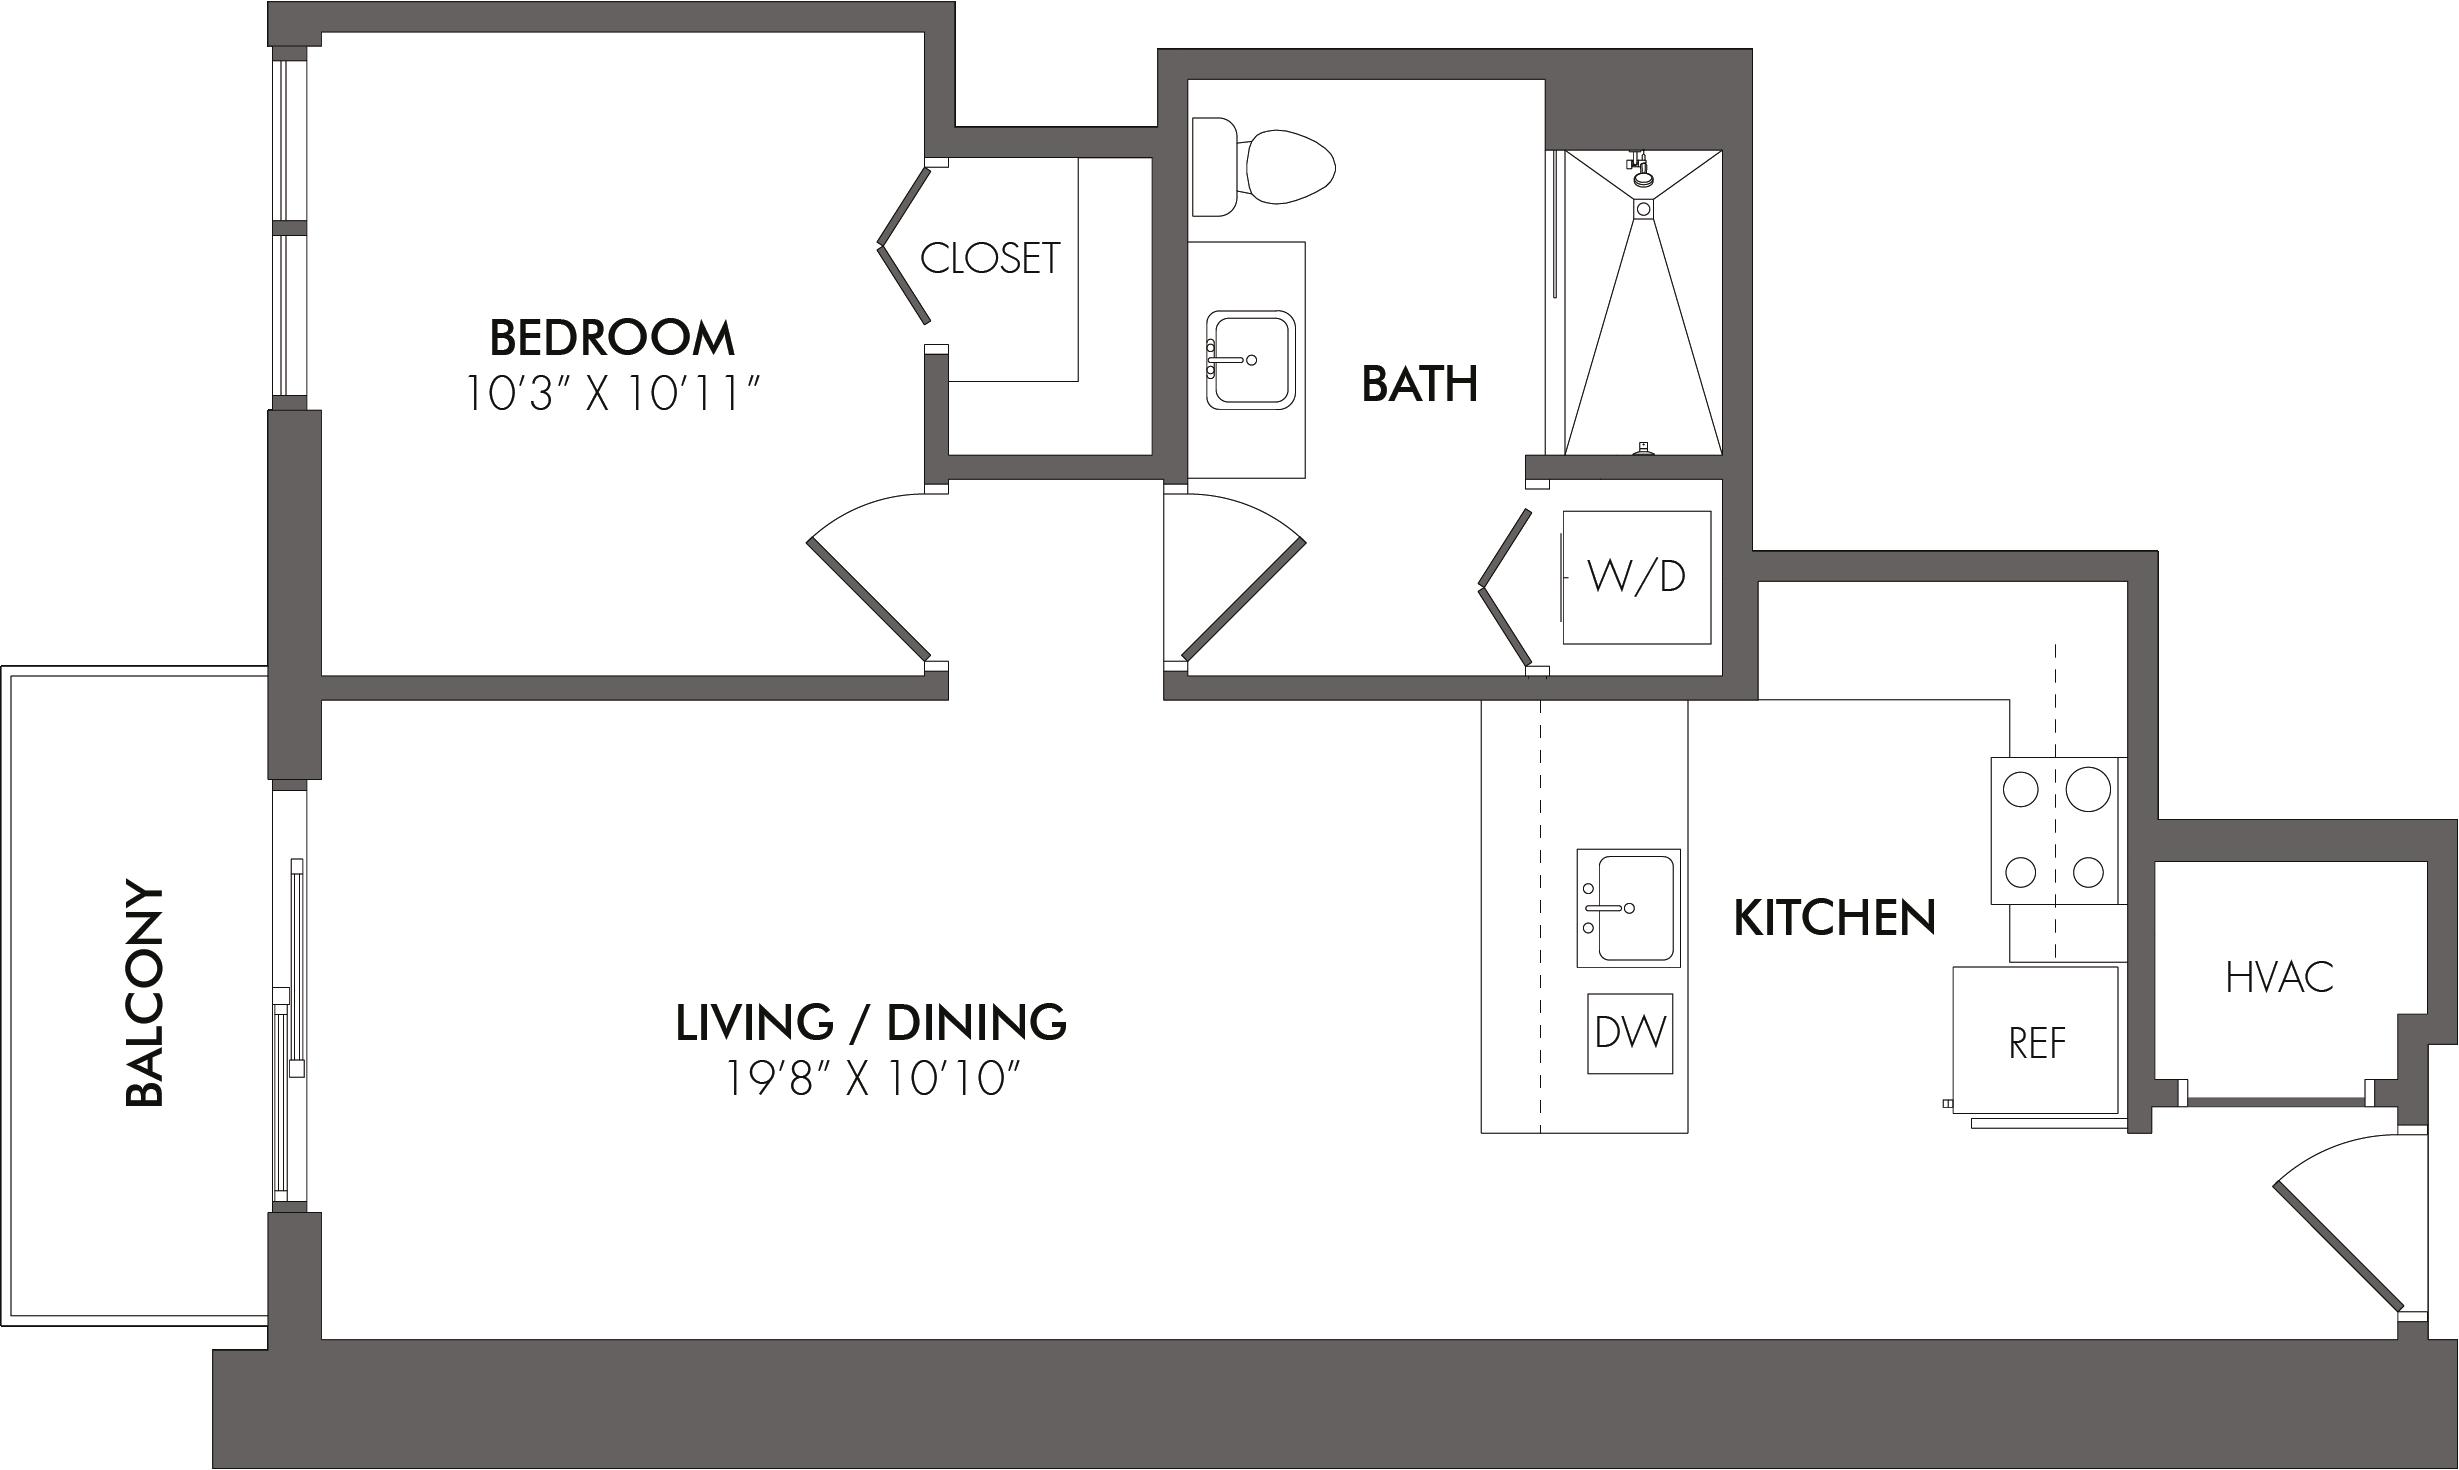 Apartment 3711 floorplan